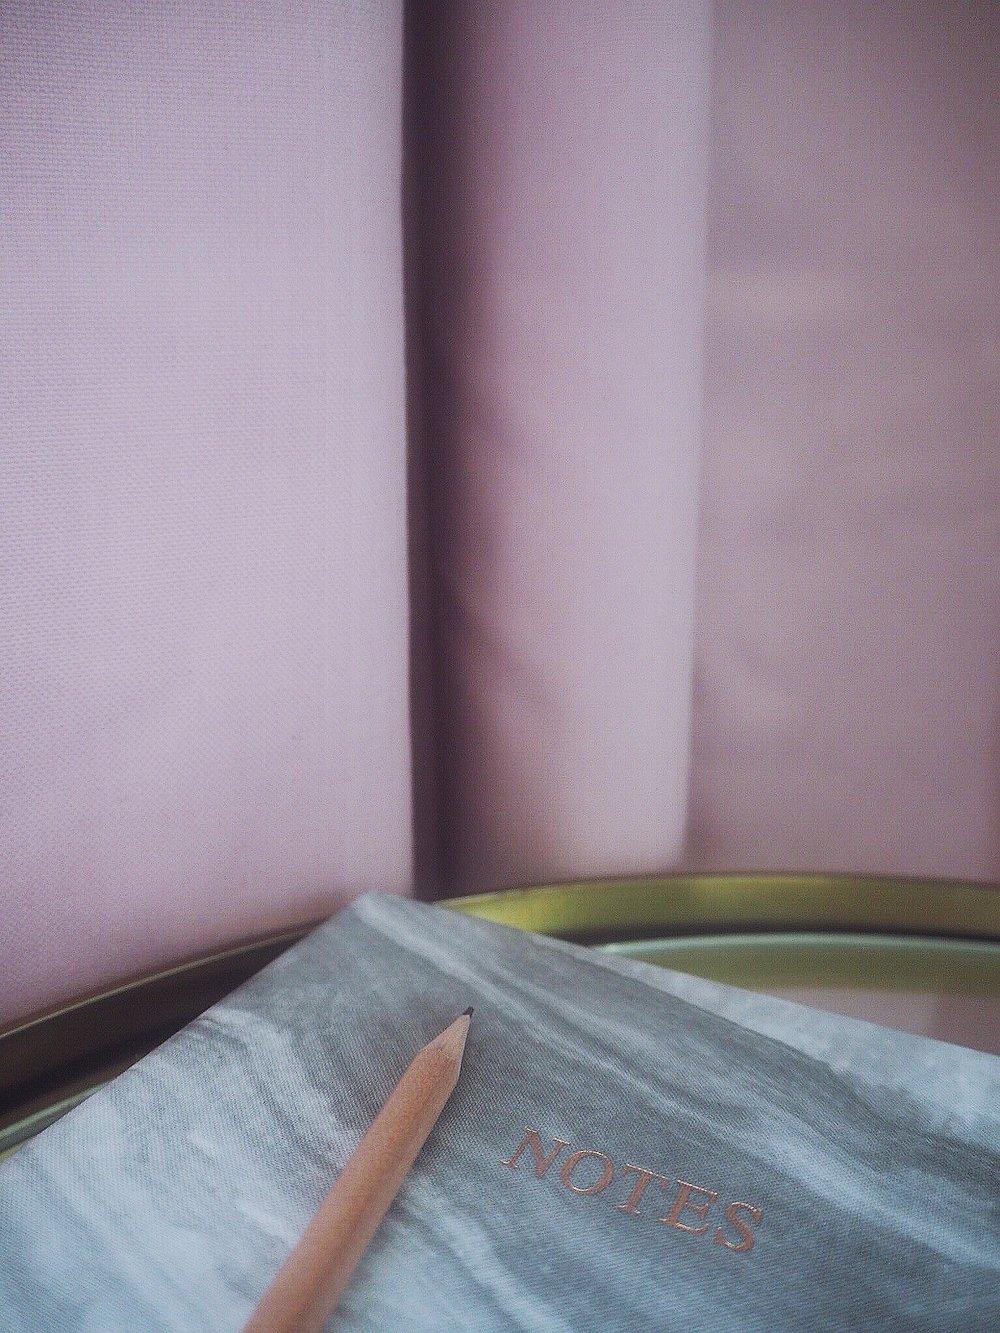 jd williams curtains.JPG